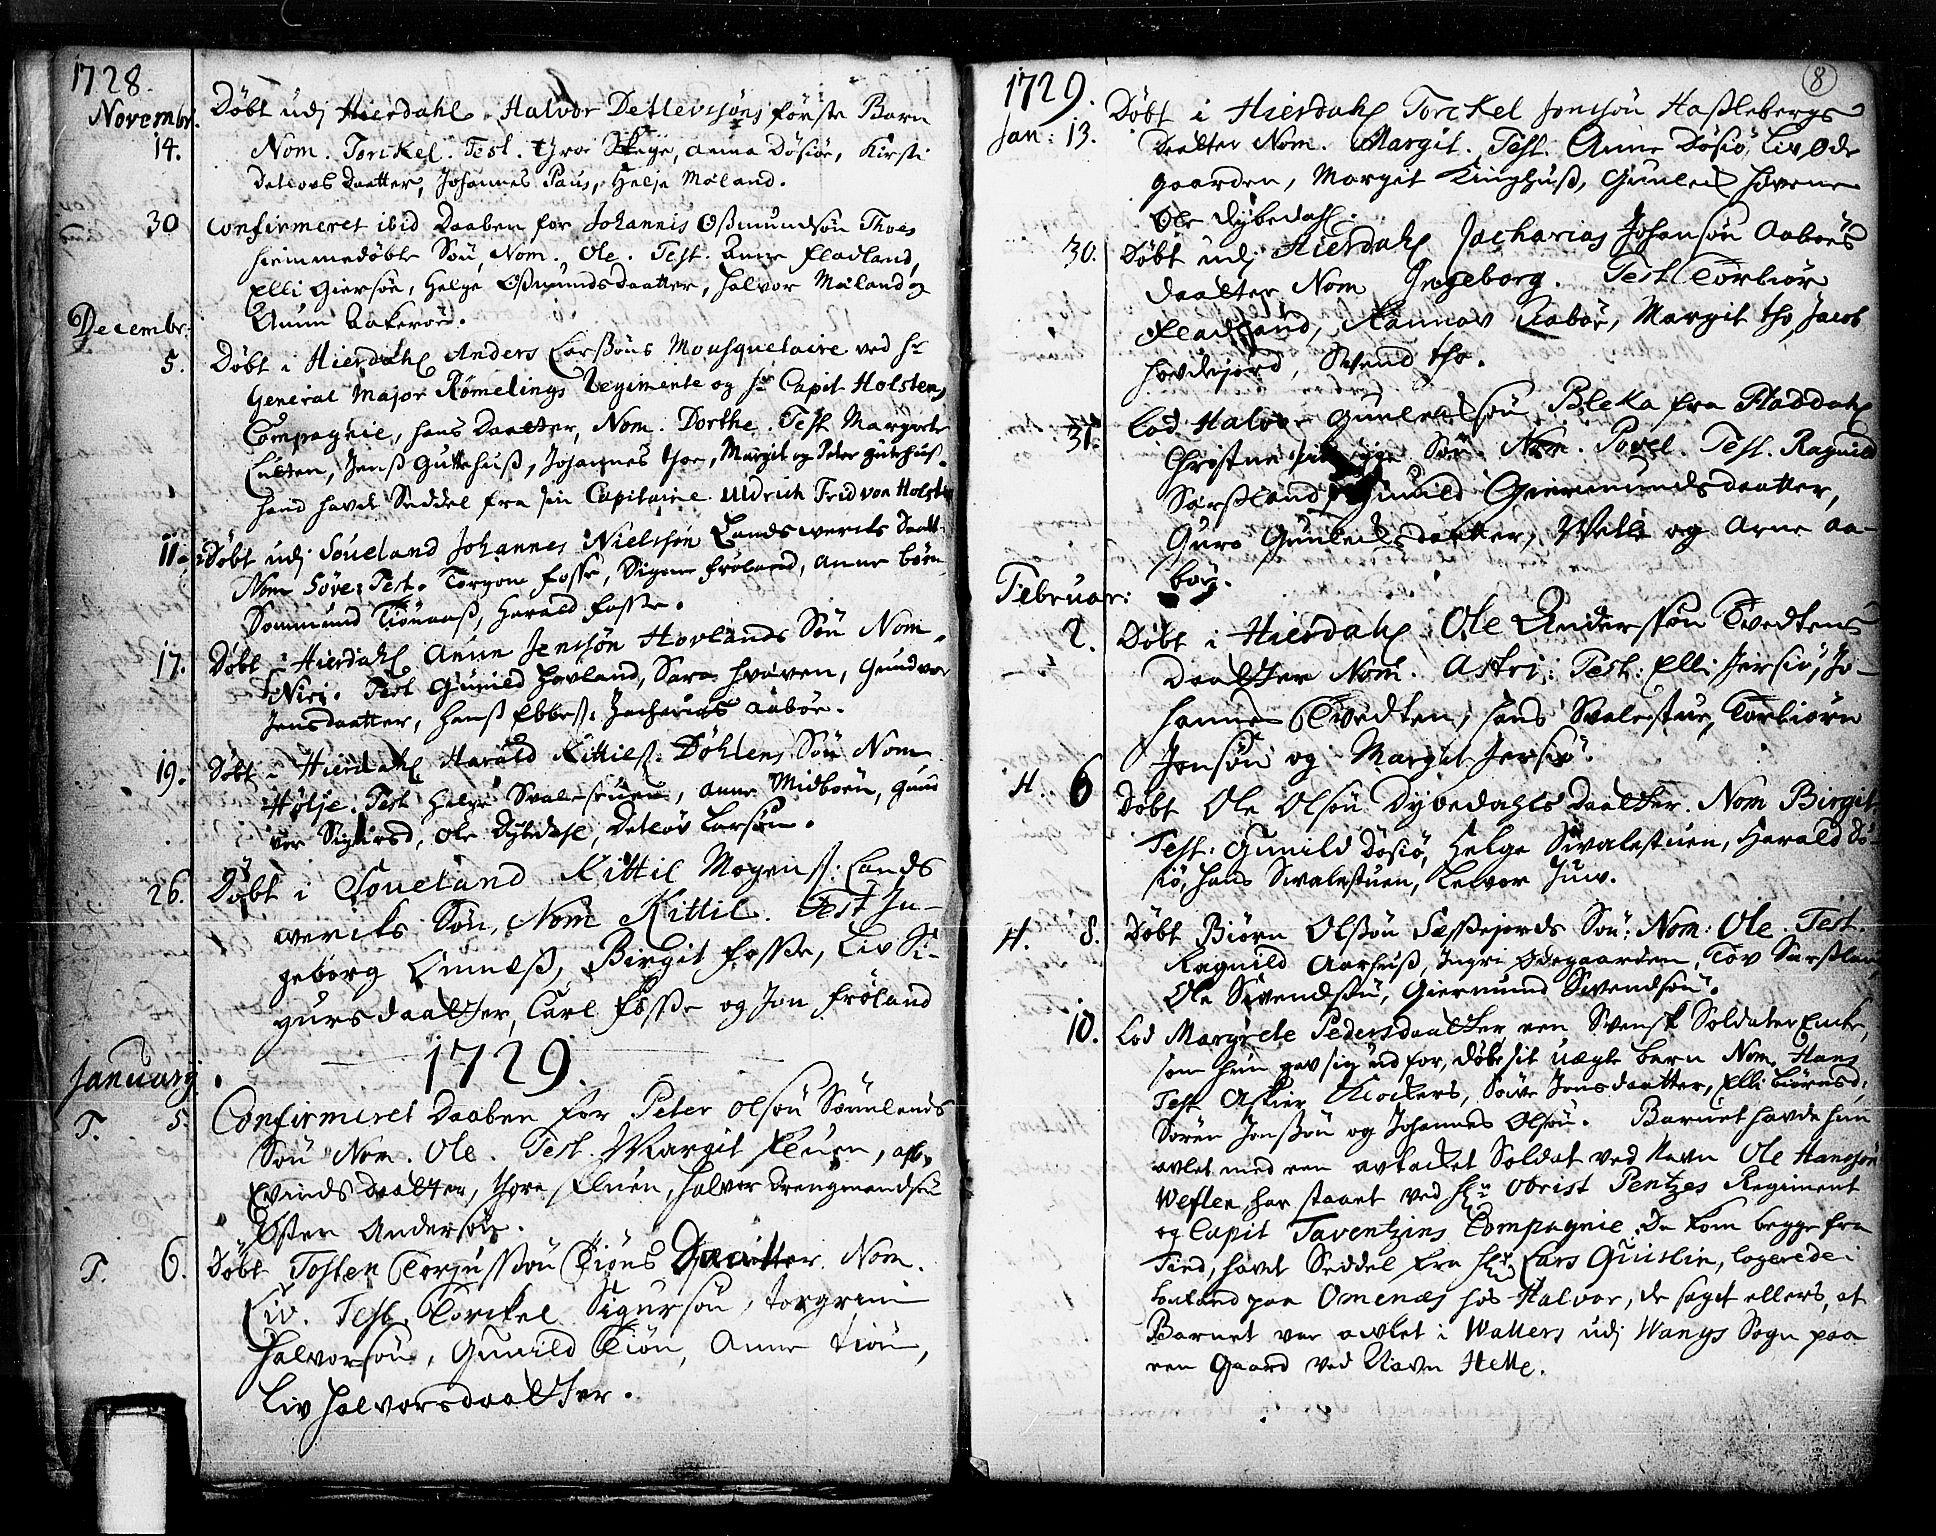 SAKO, Hjartdal kirkebøker, F/Fa/L0003: Ministerialbok nr. I 3, 1727-1775, s. 8